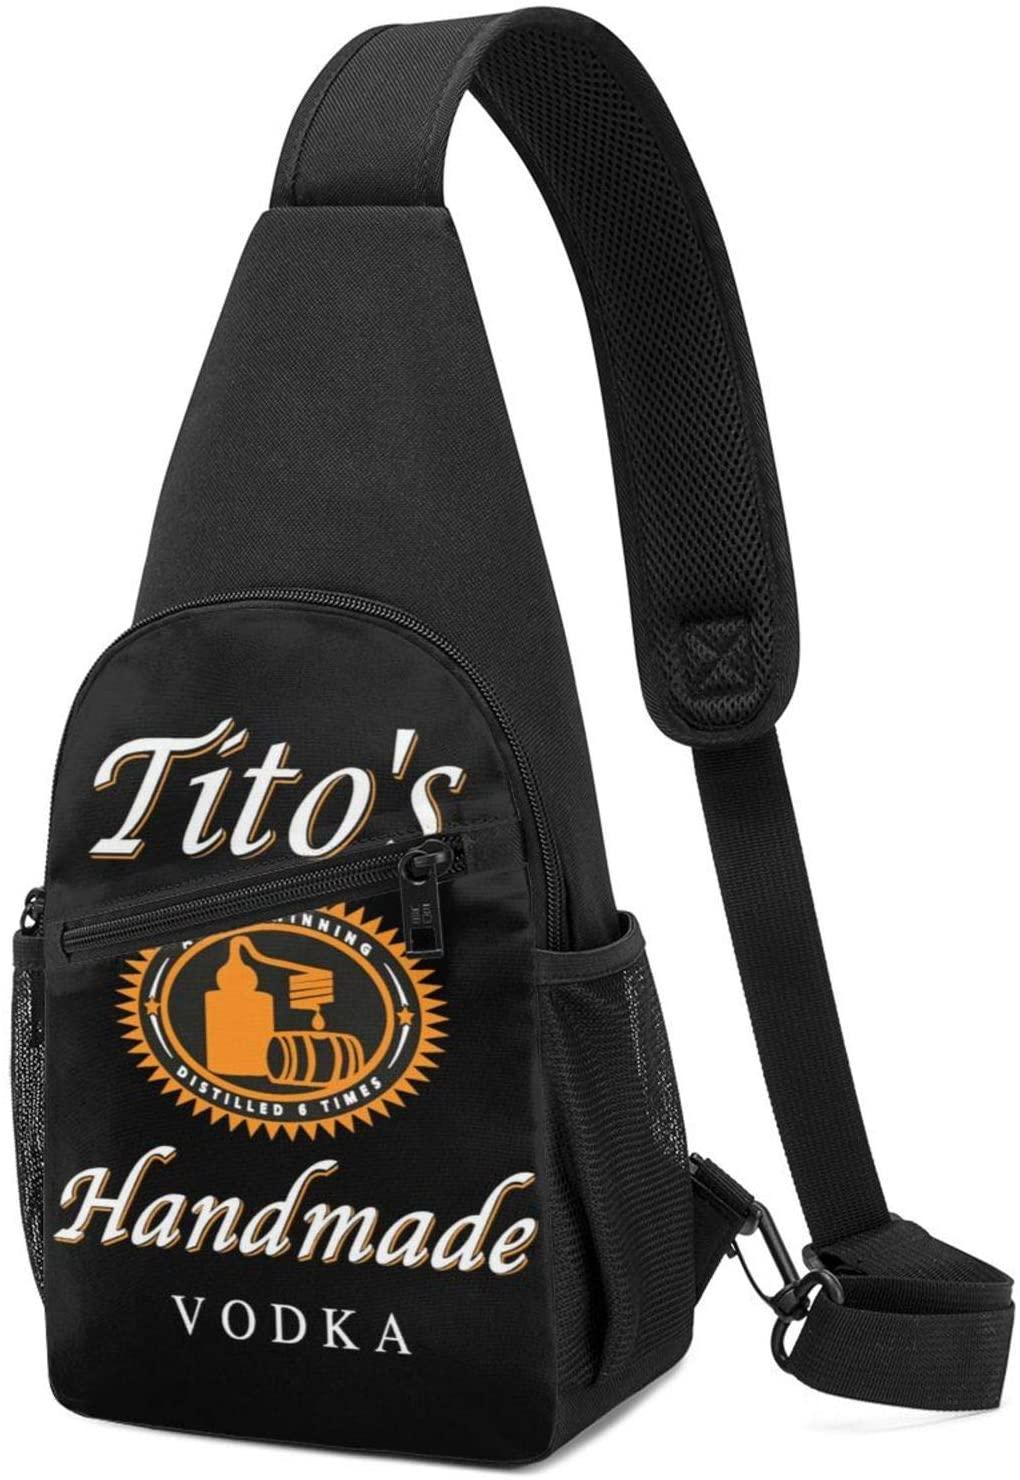 Tito'S Handmade Vodka Sling Bag Chest Bag Shoulder Backpack Cross Body